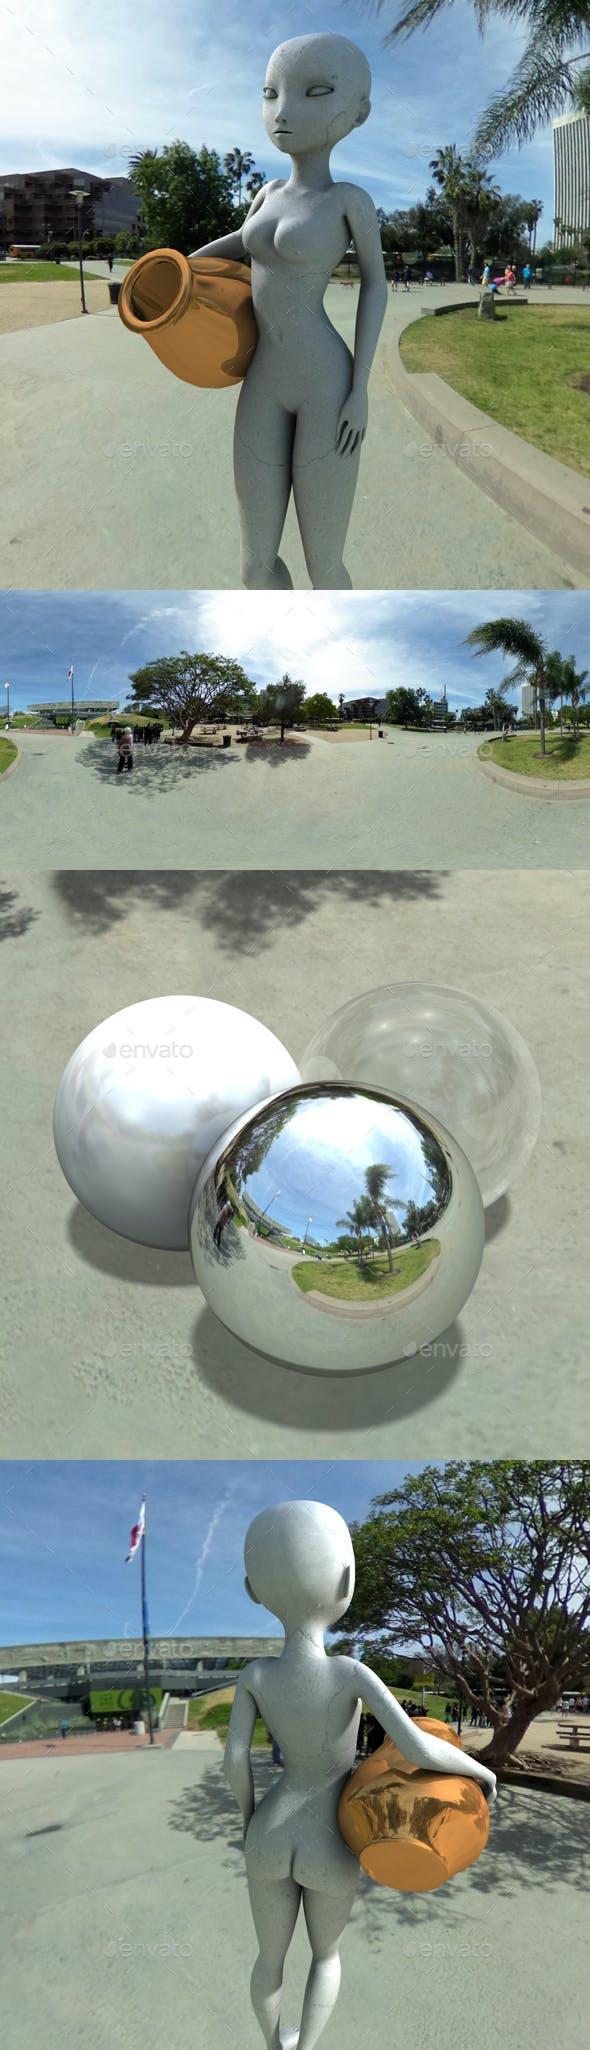 Sunny Tar Pit Park HDRI - 3DOcean Item for Sale